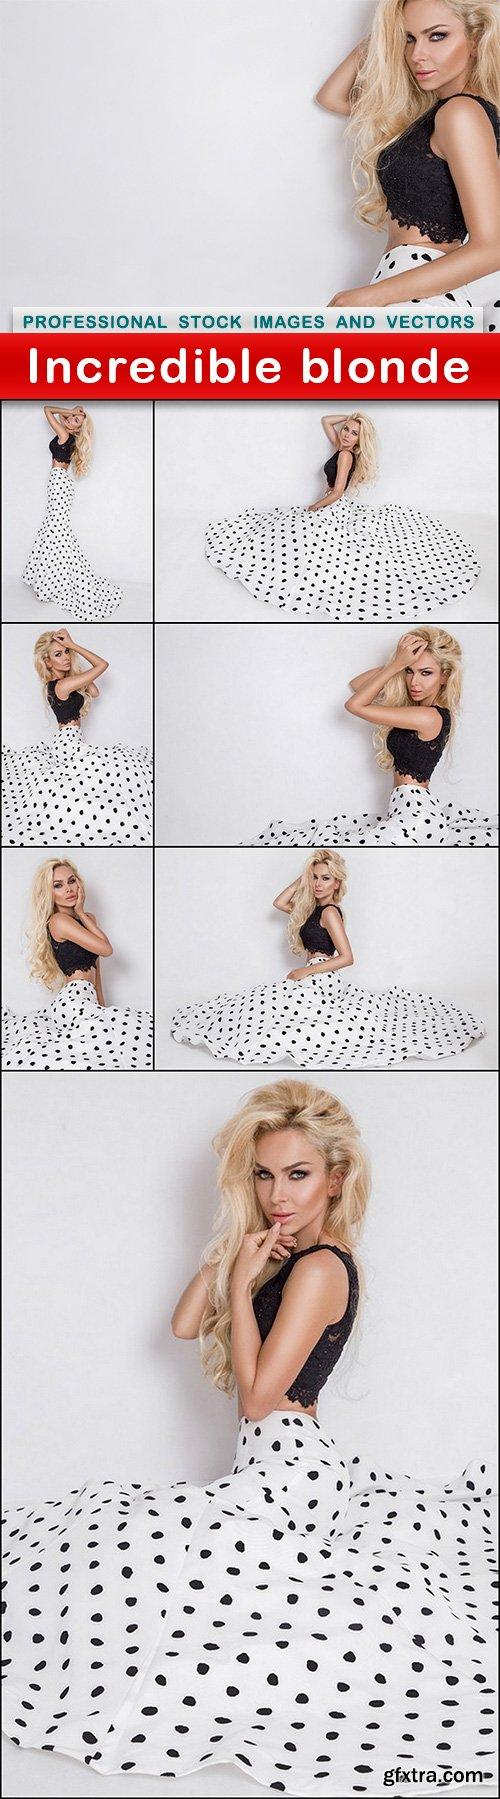 Incredible blonde - 8 UHQ JPEG